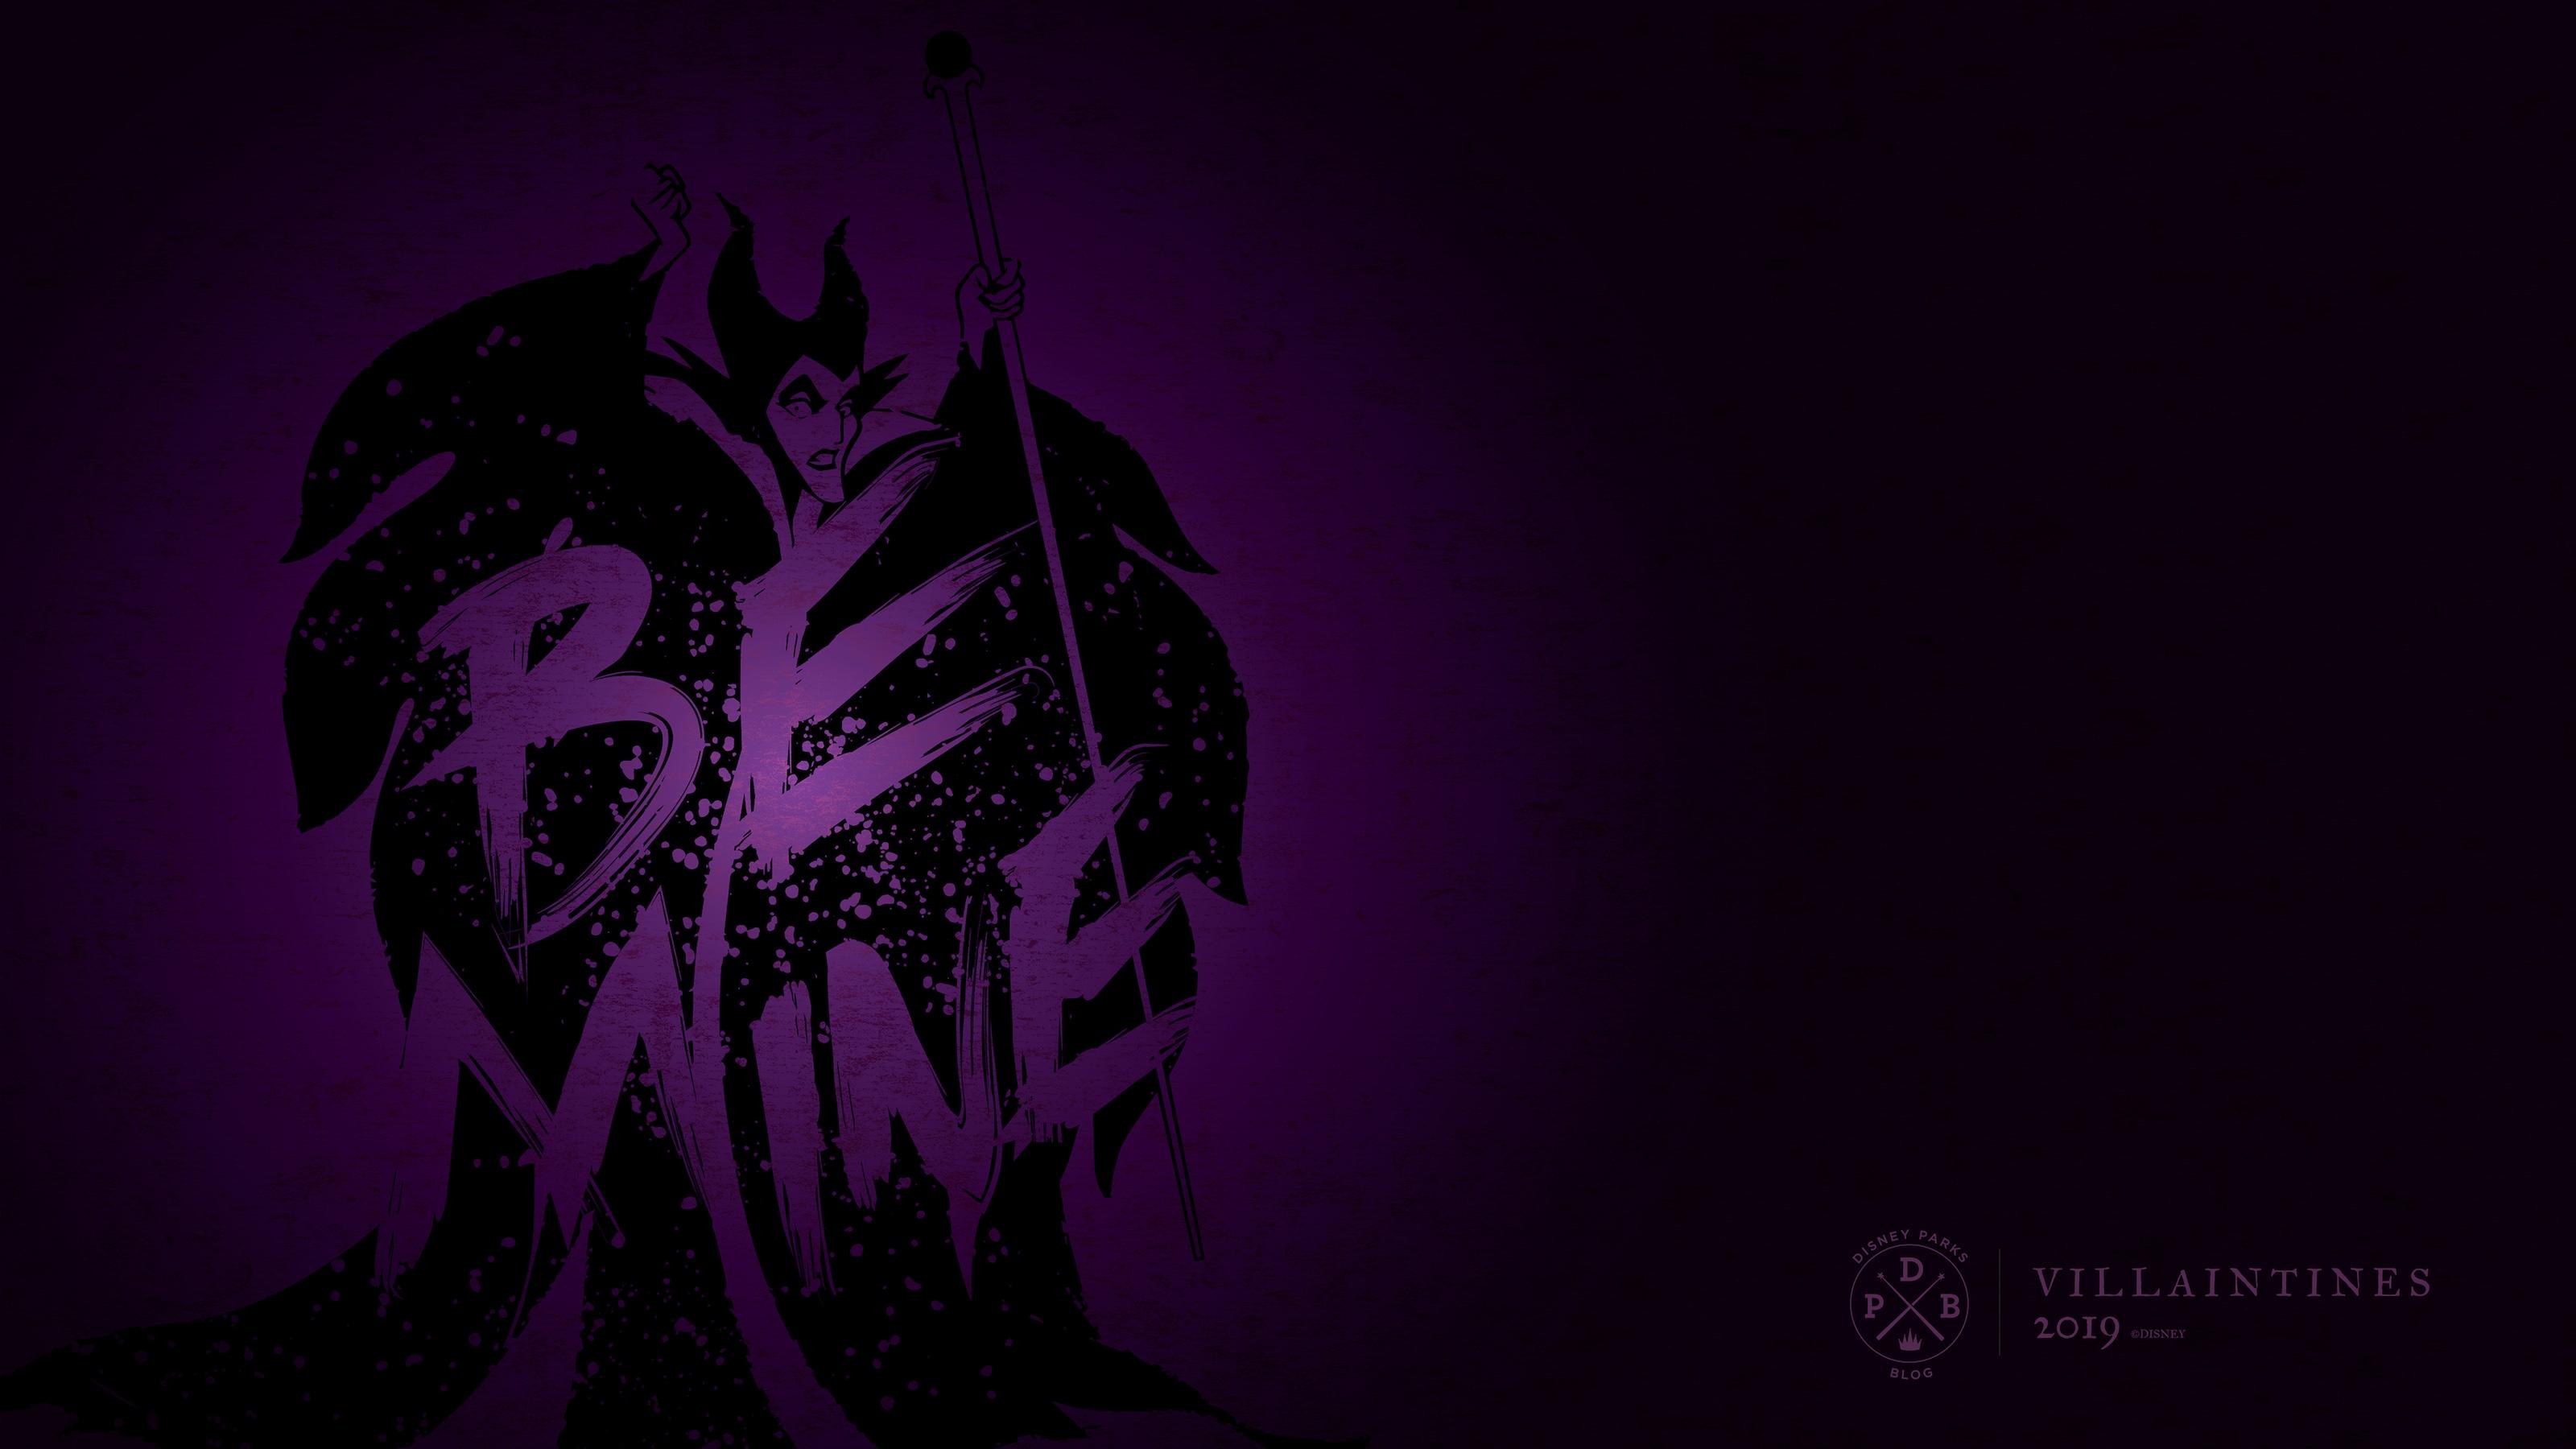 Maleficent Villaintine S Day 2019 Desktop Ipad Disney